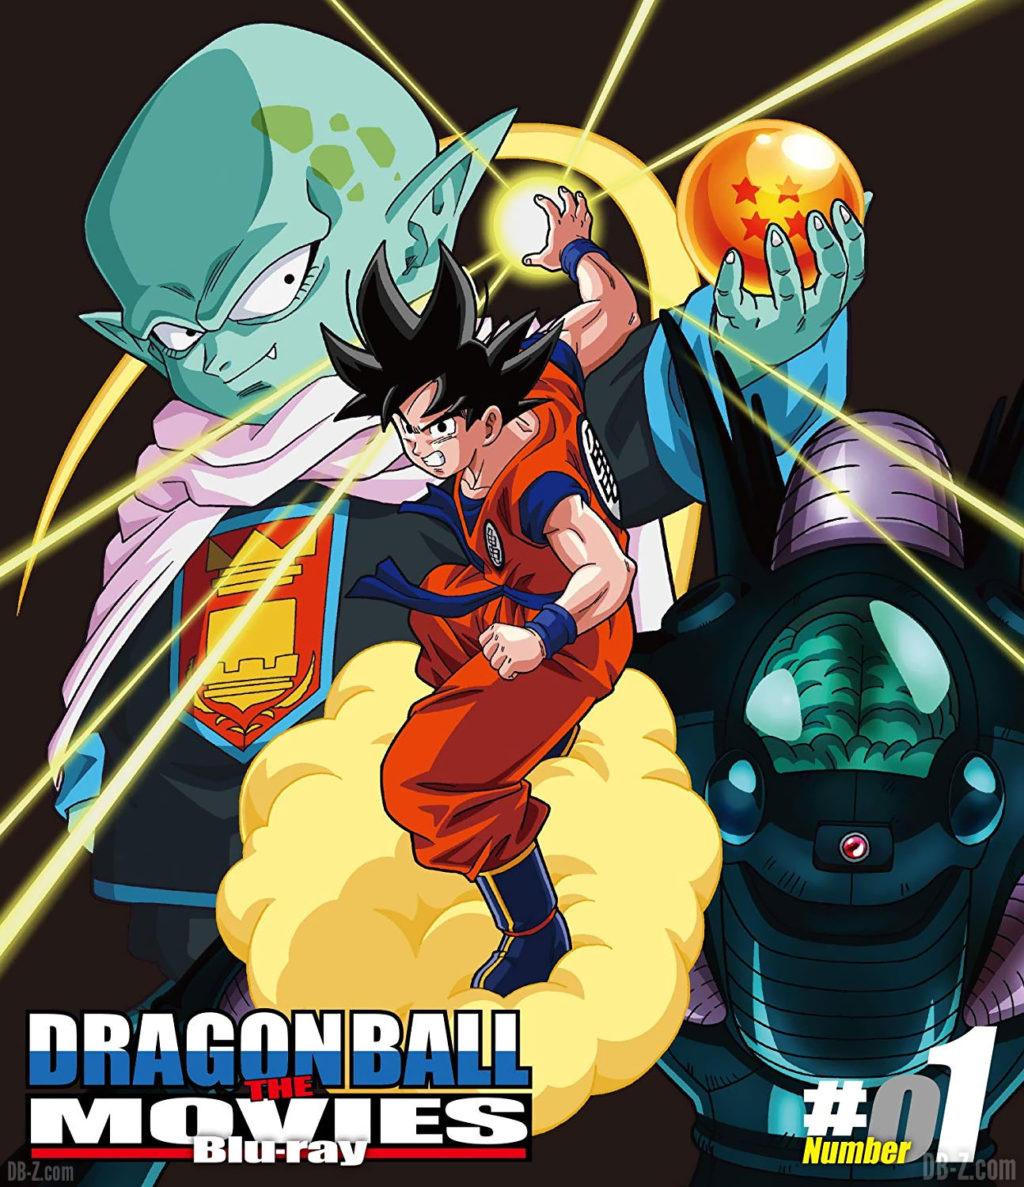 DRAGON BALL THE MOVIES Blu-ray 01